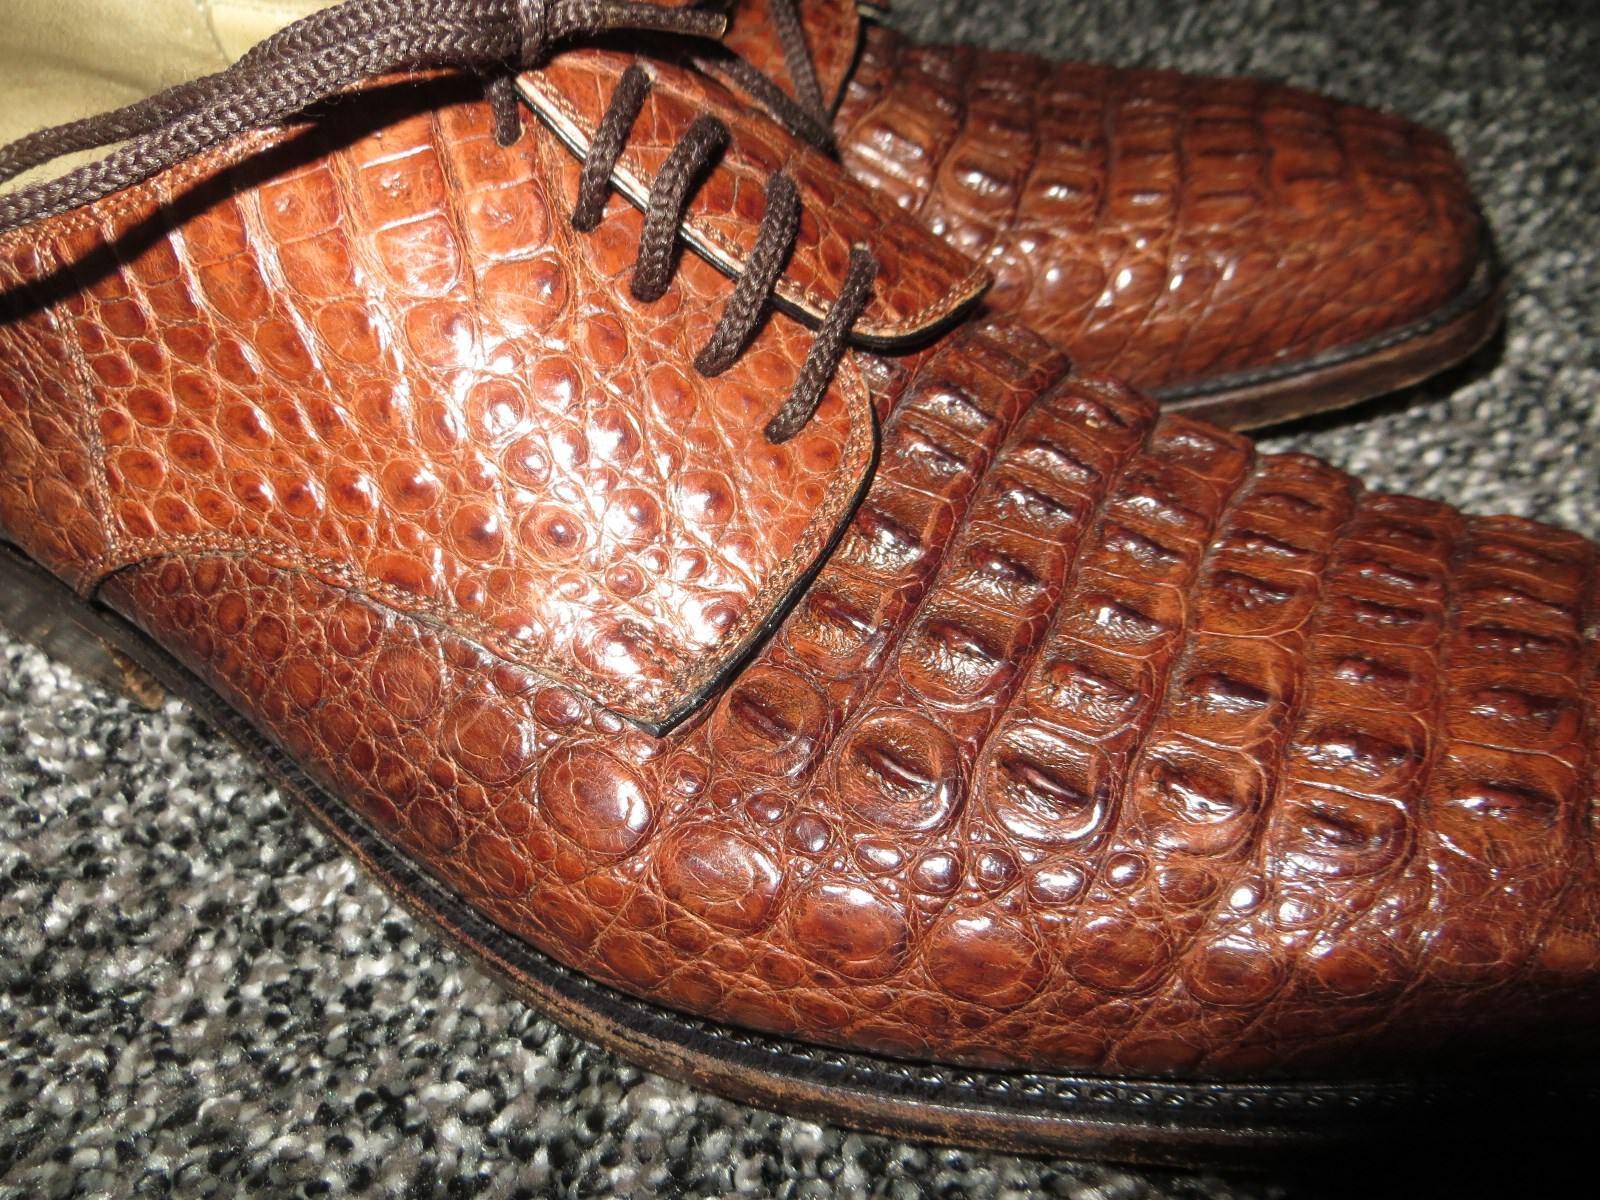 RARE RARE RARE Yacare Caiman Uomo Bespoke Brown Oxford Alligator Crocodile Dress Shoe 10 M 1e7c04